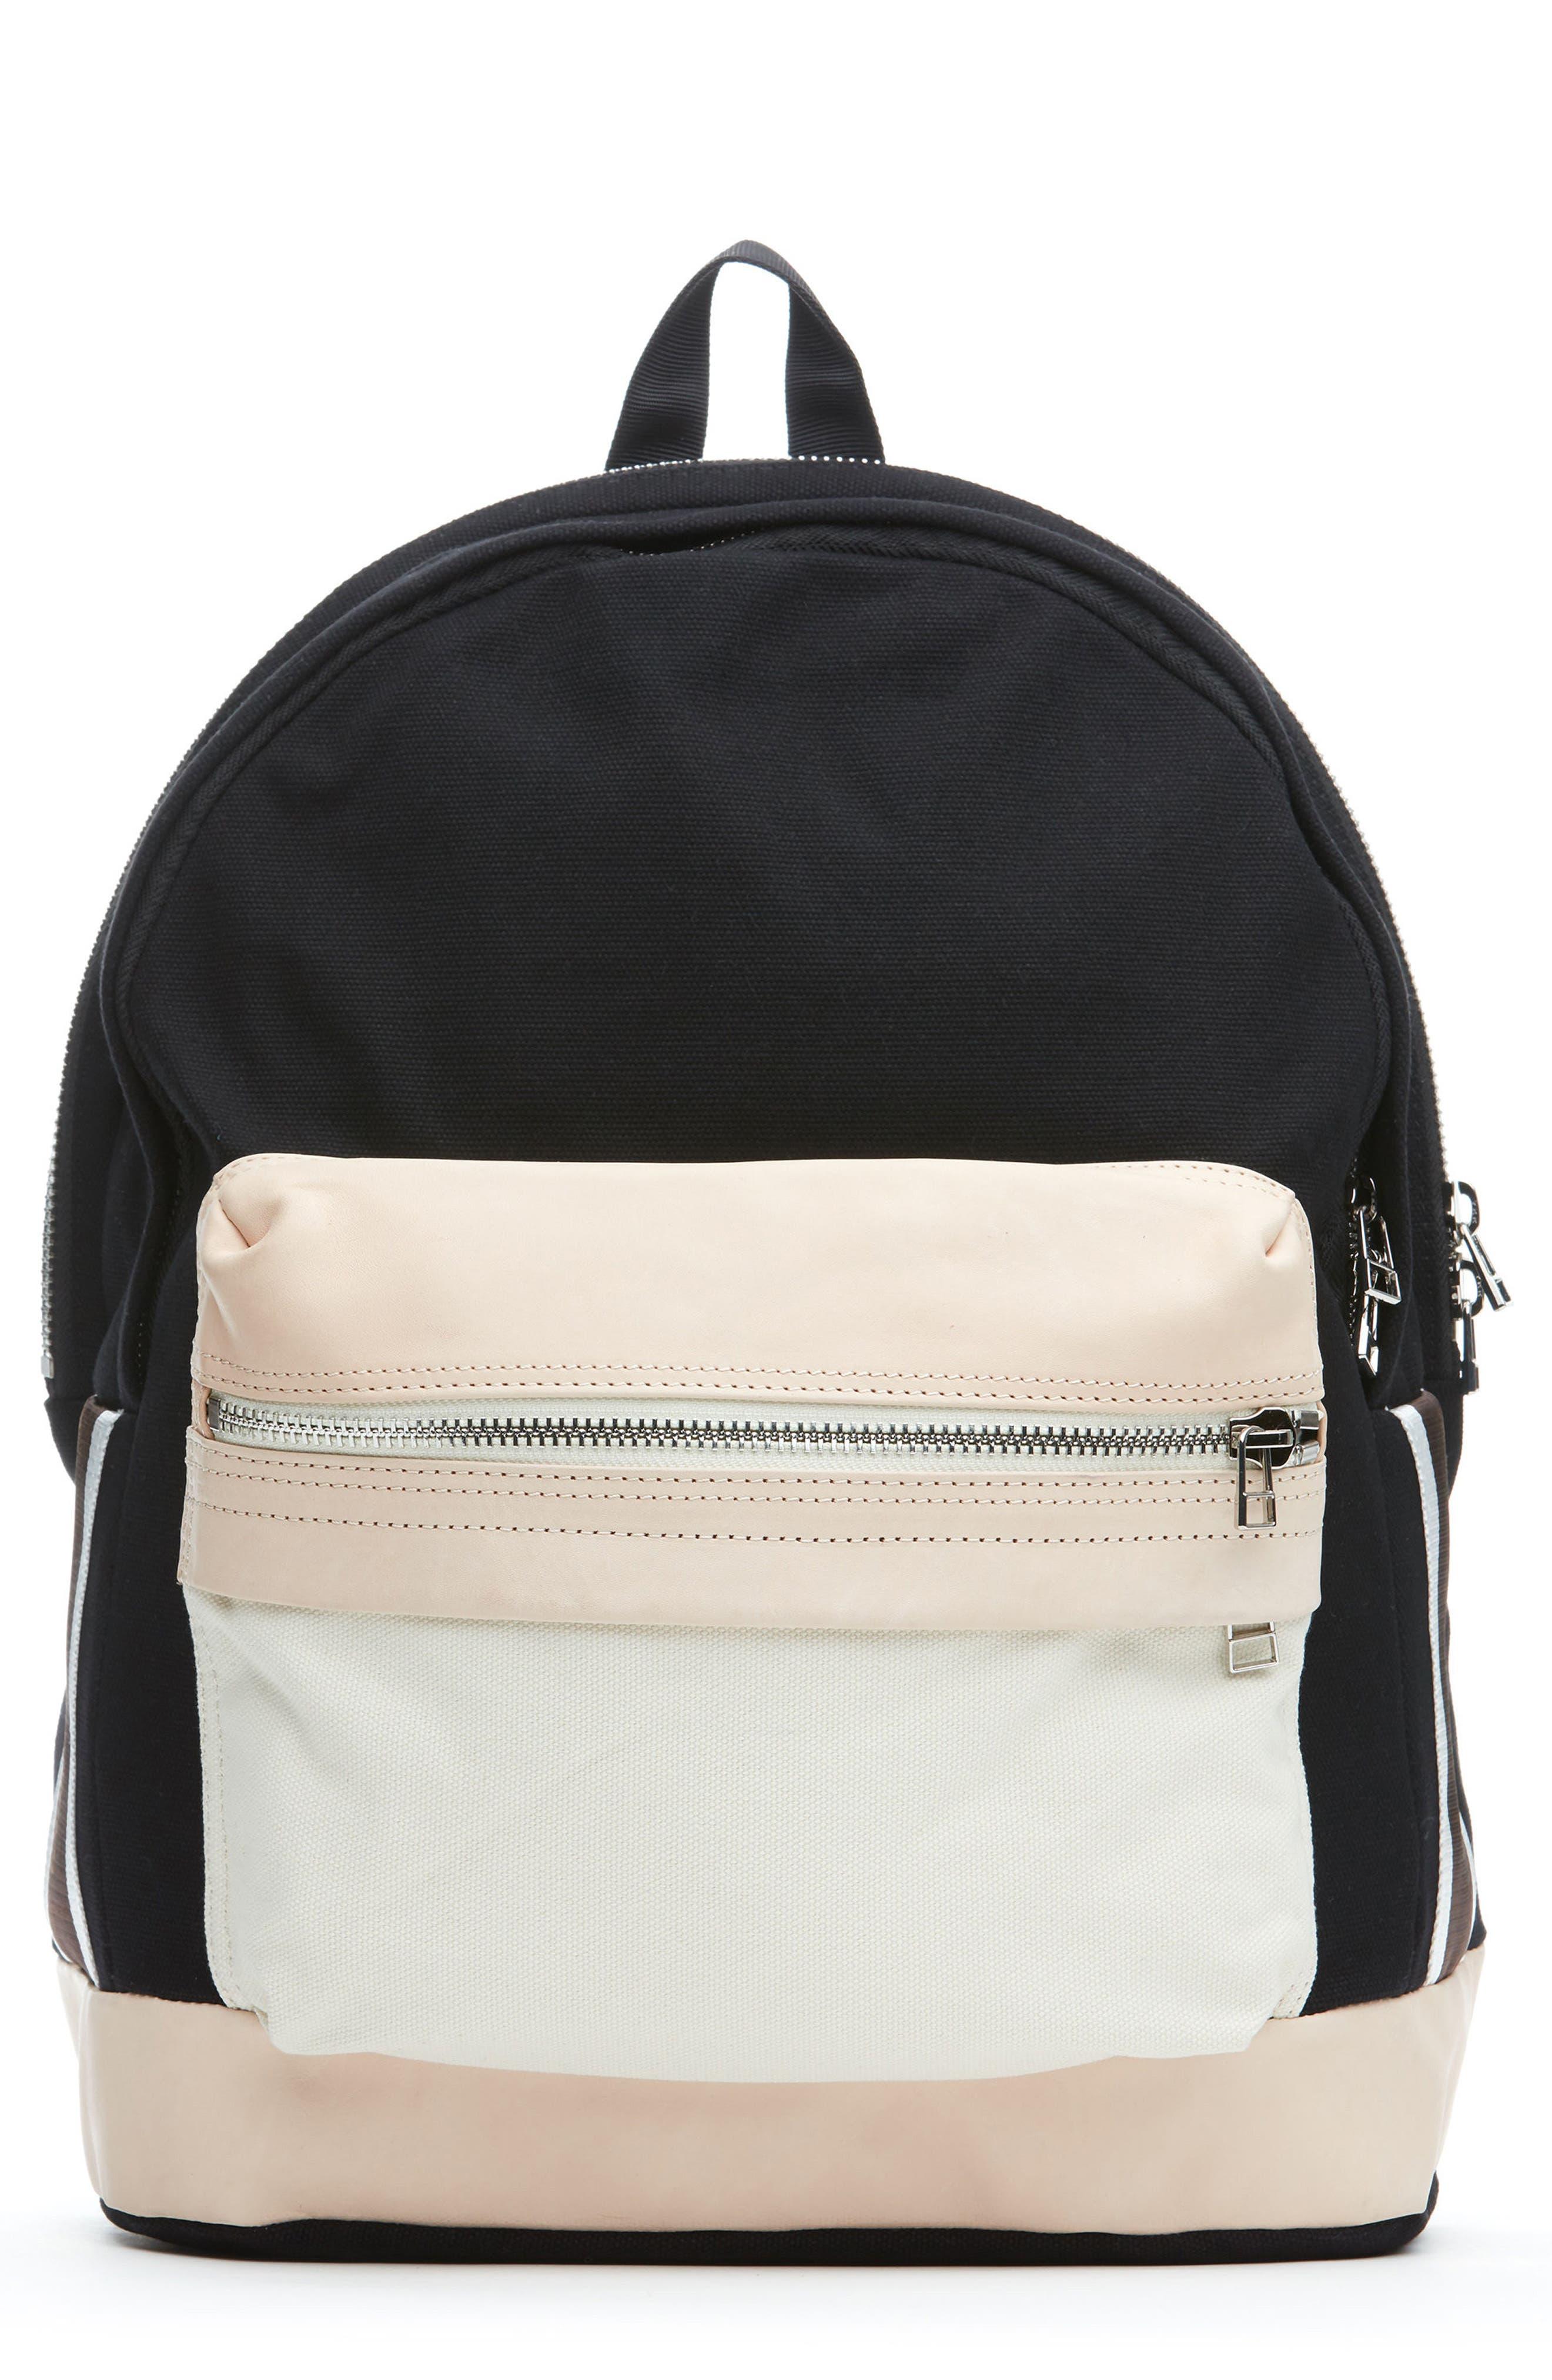 Lancer Backpack,                             Main thumbnail 1, color,                             010